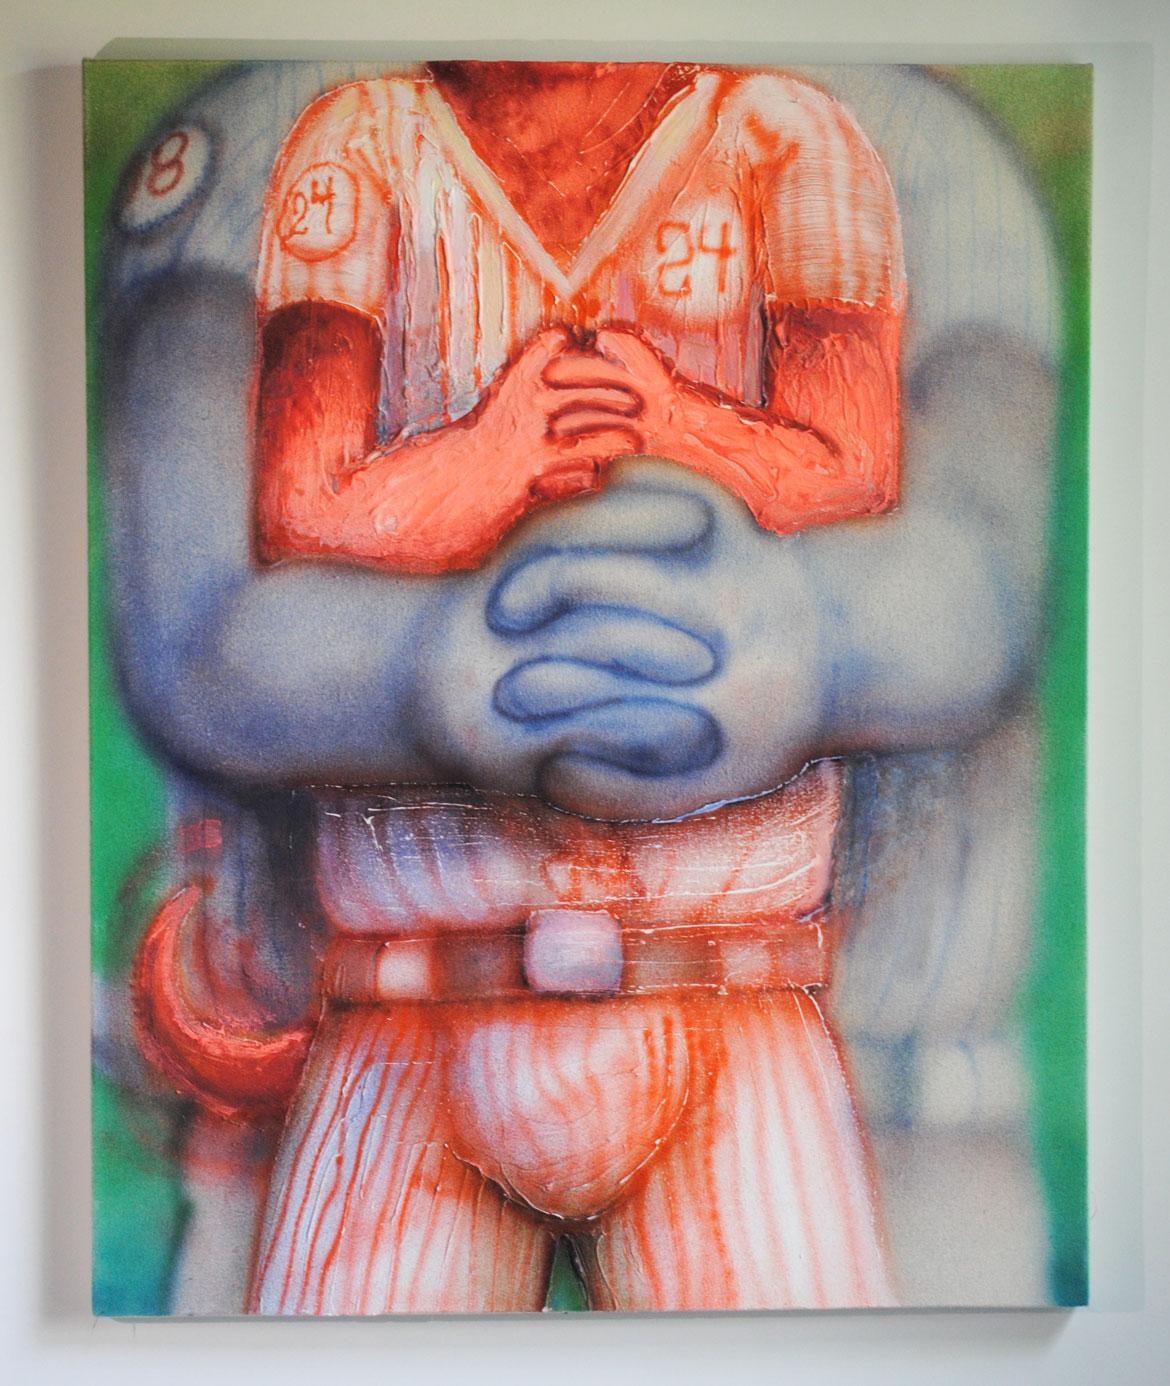 "Mark Zubrovich ""Post-Game Bear Hugs"" / 2018 / acrylic on raw canvas / 24 x 30"""